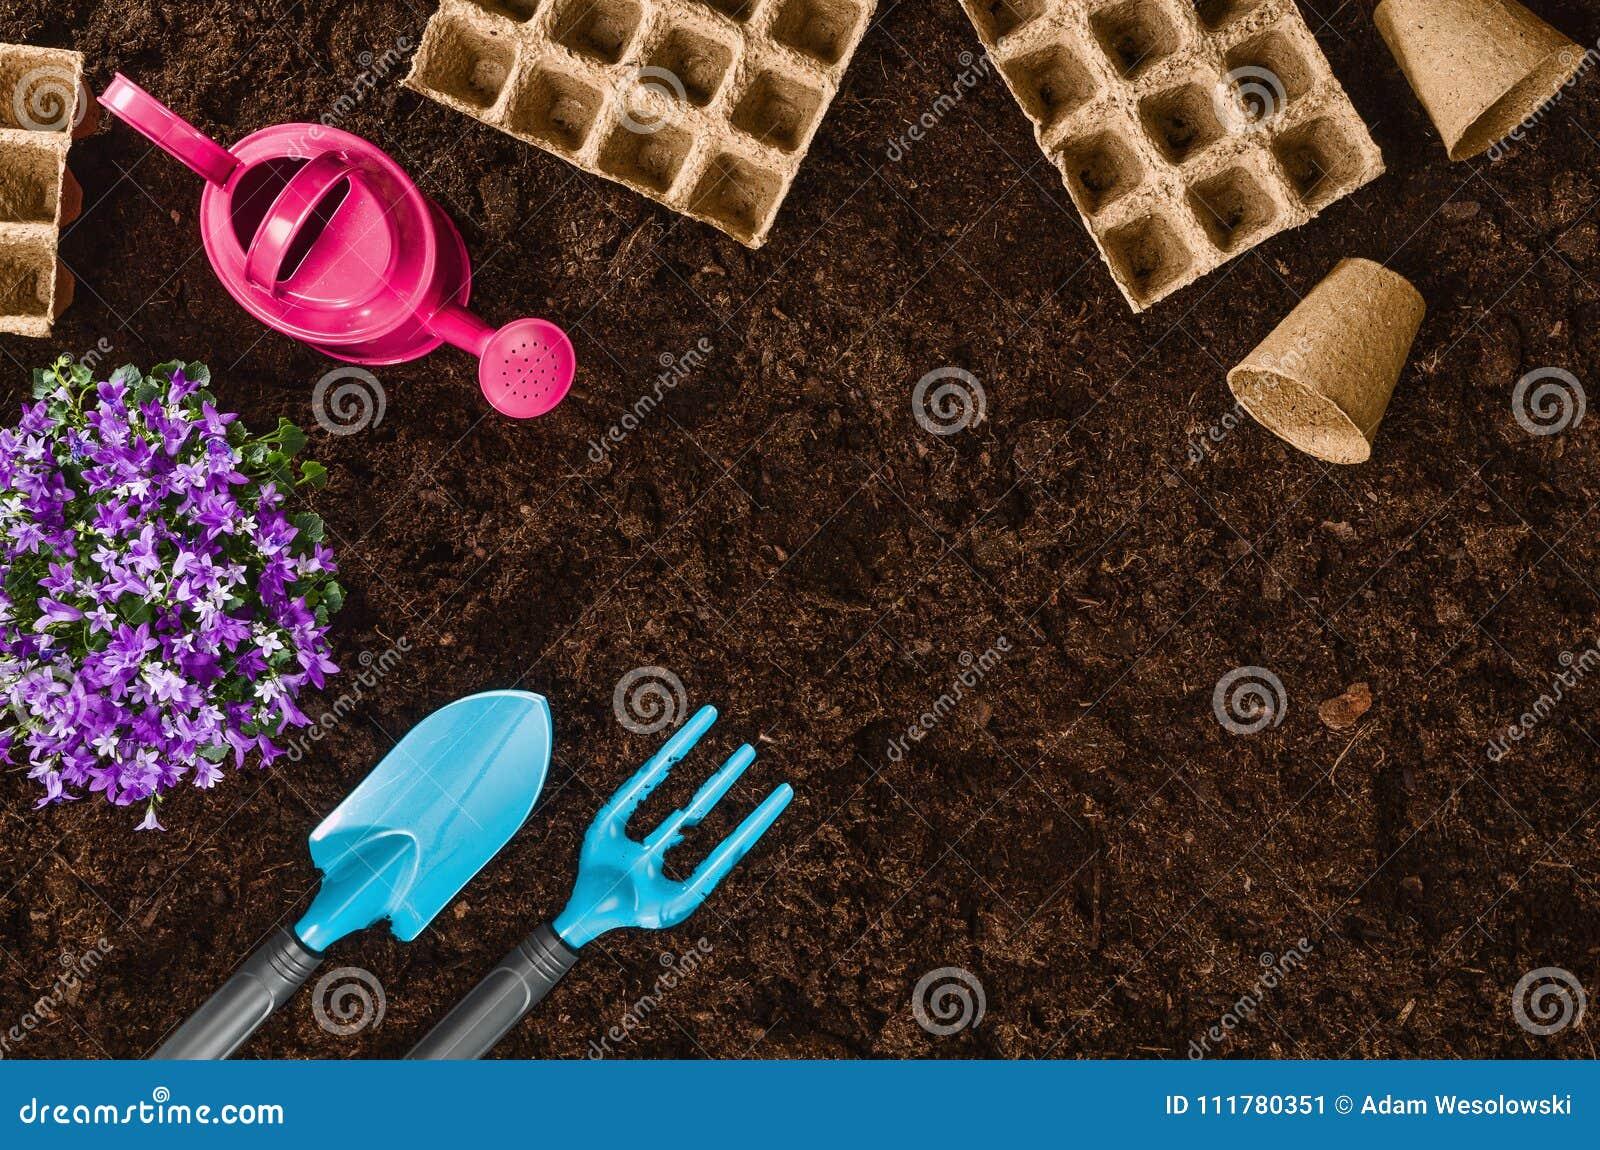 Gardening tools on garden soil texture background top view